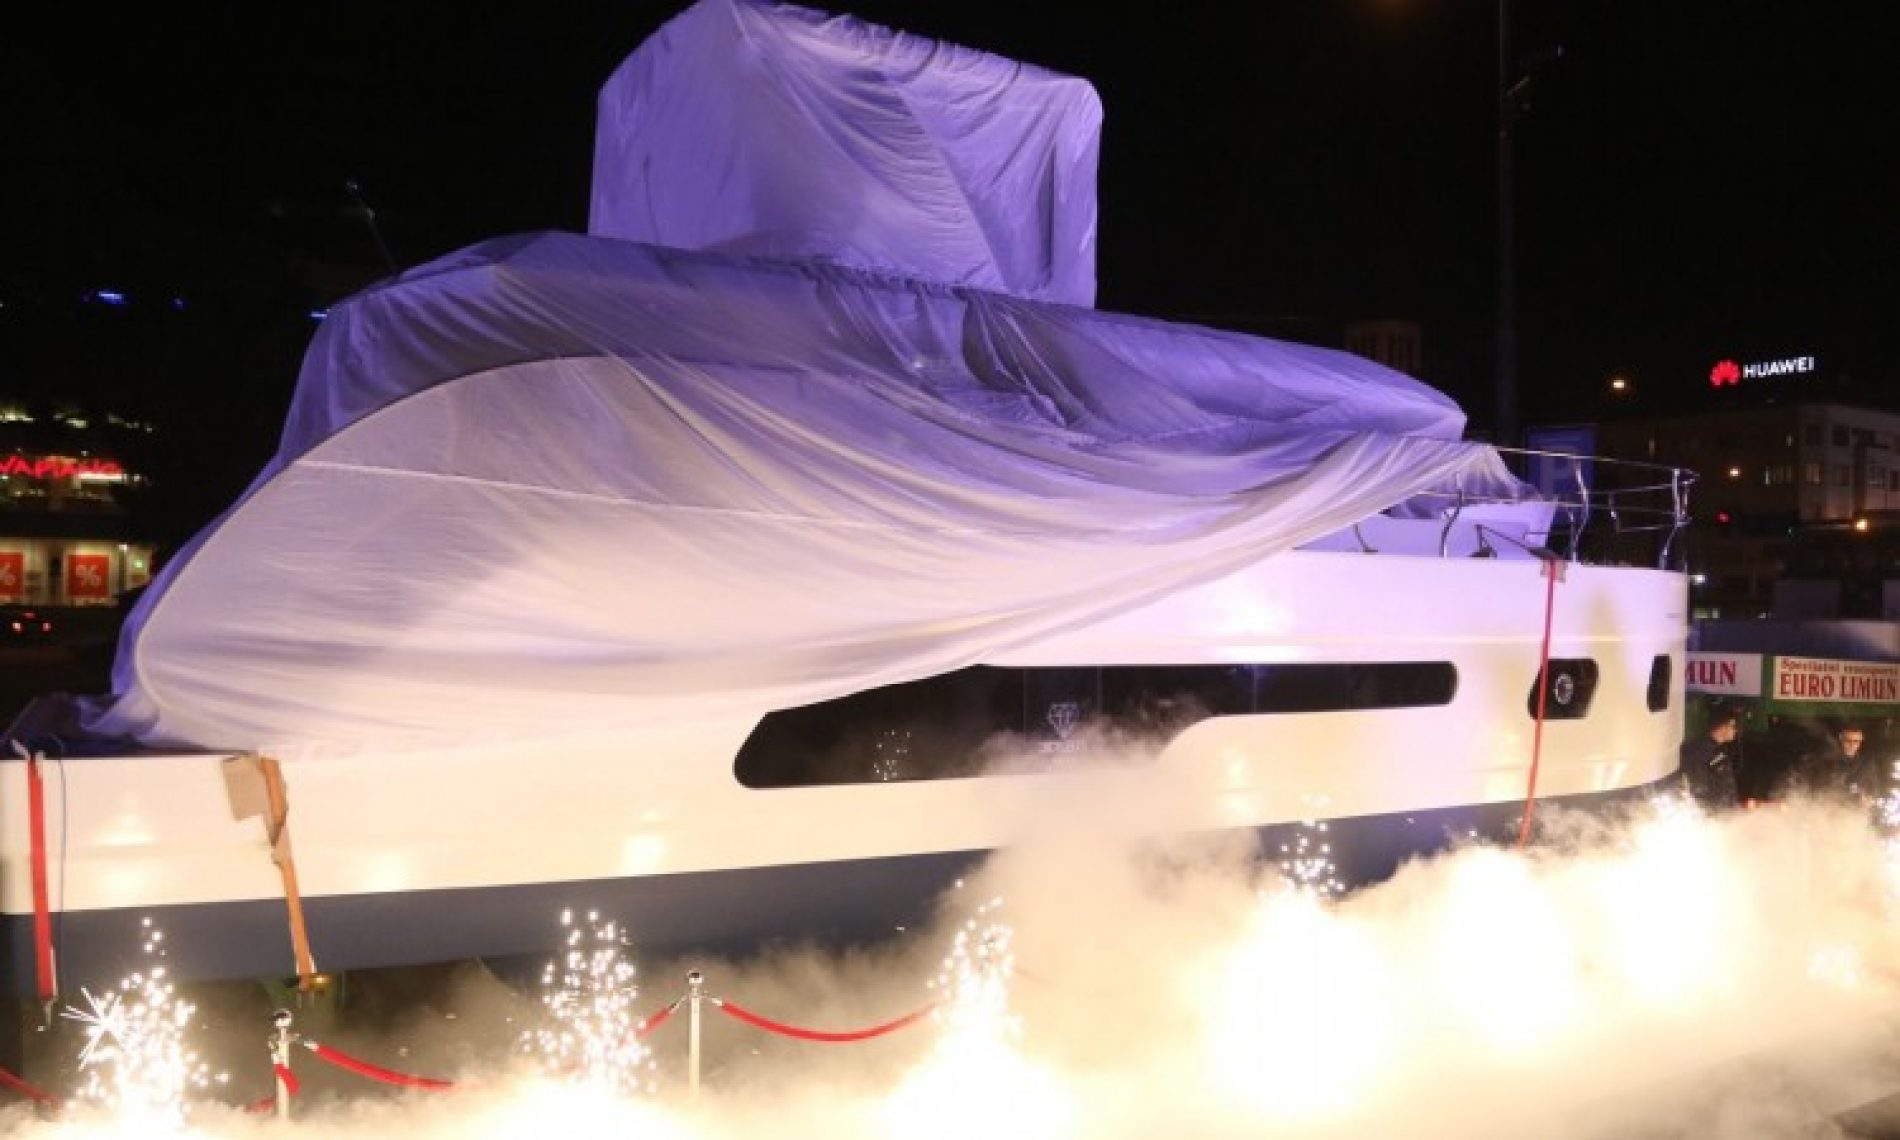 U Sarajevu predstavljen novi model jahte bosanske firme Derubis Yachts